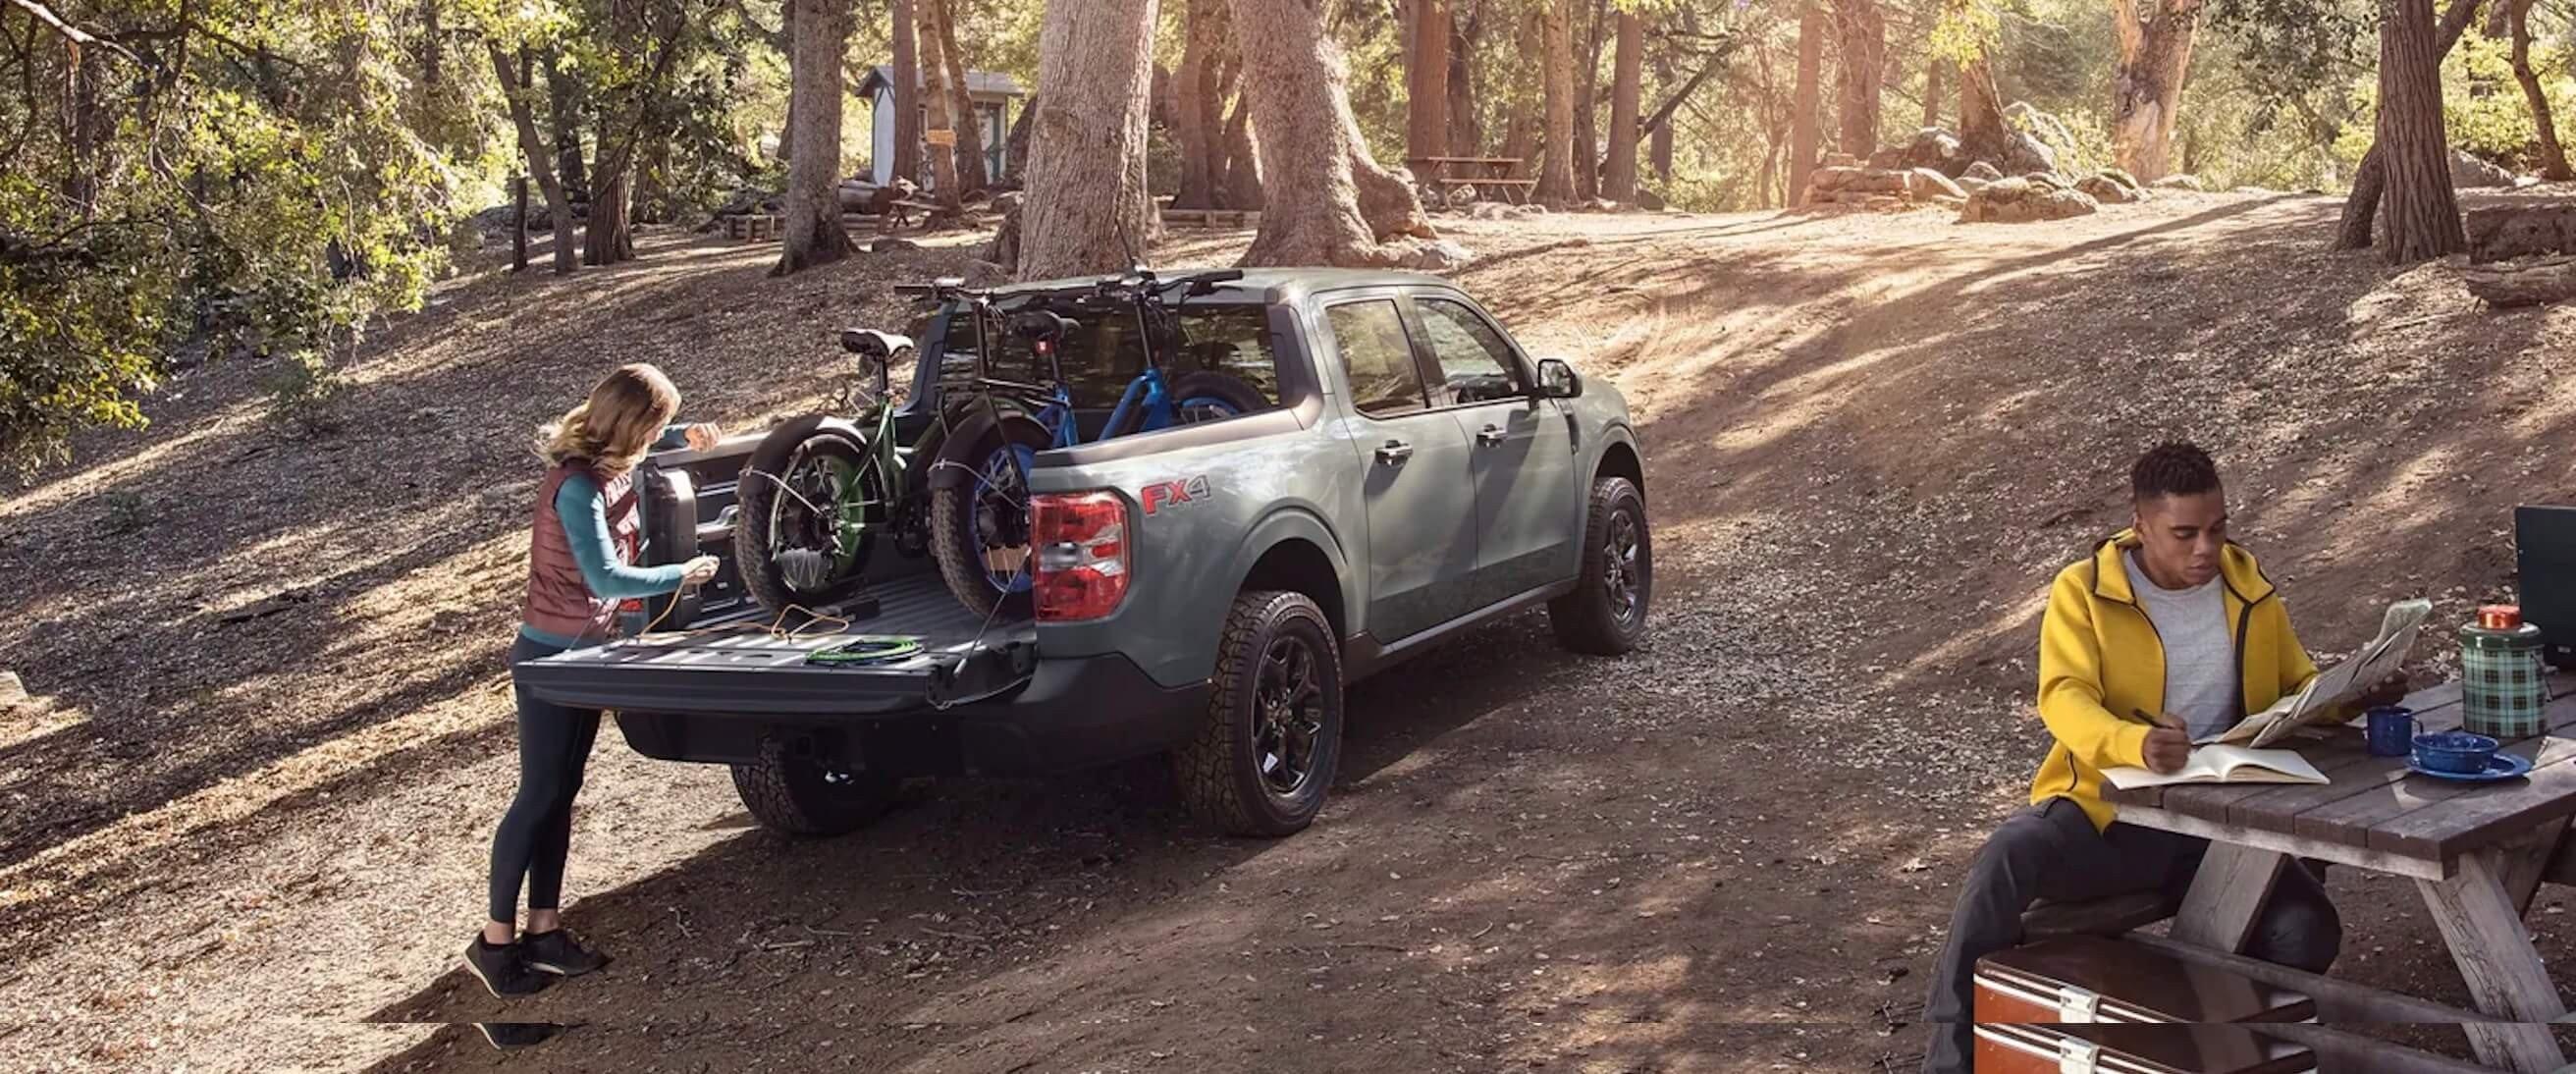 Ford Maverick used camping and hauling bicycles